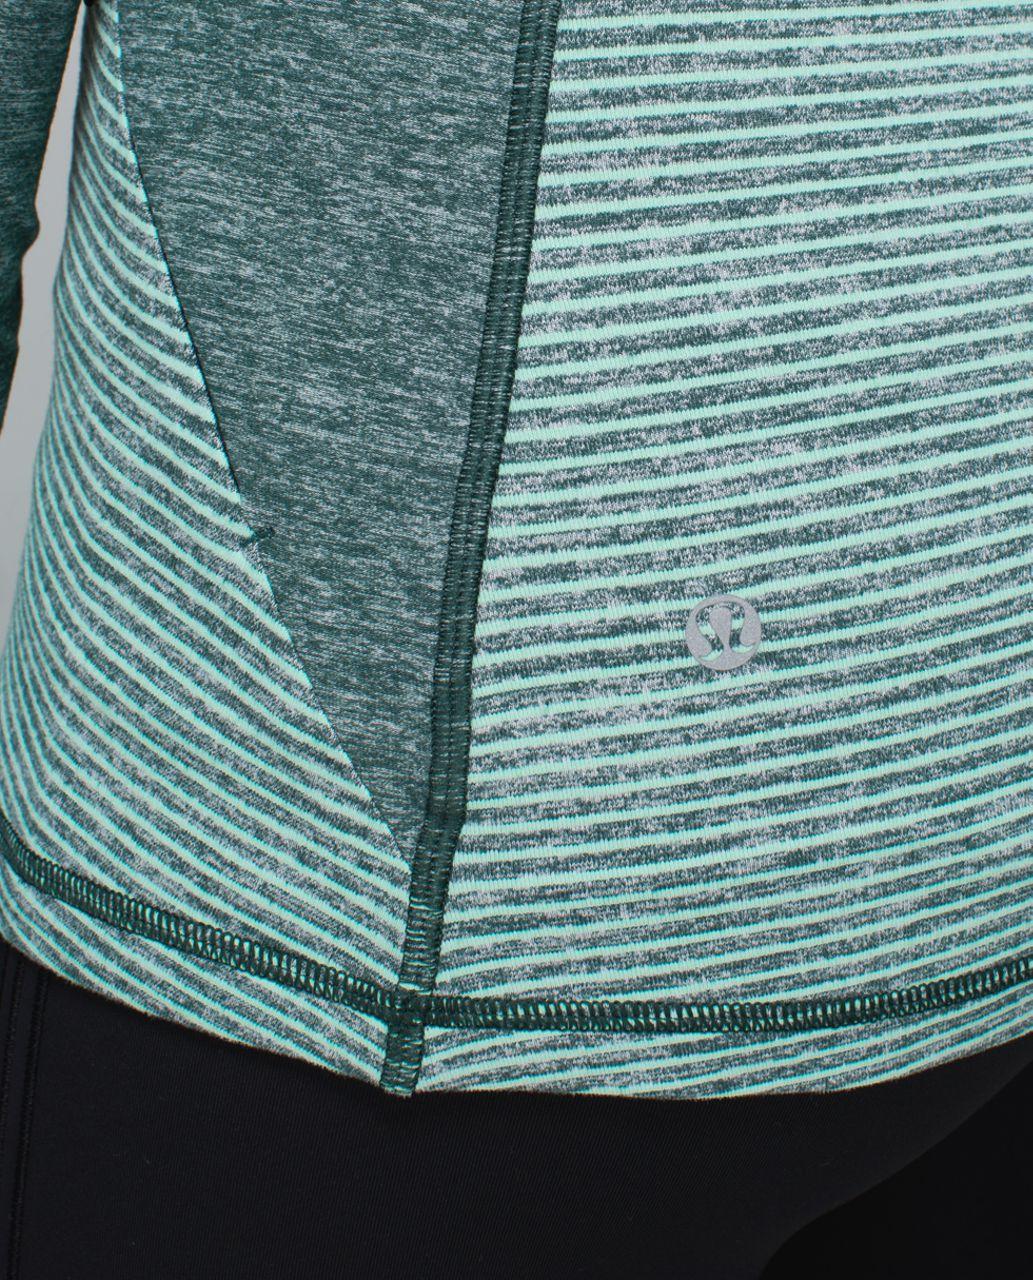 Lululemon Race Your Pace 1/2 Zip - Hyper Stripe Heathered Fuel Green Toothpaste / Heathered Fuel Green